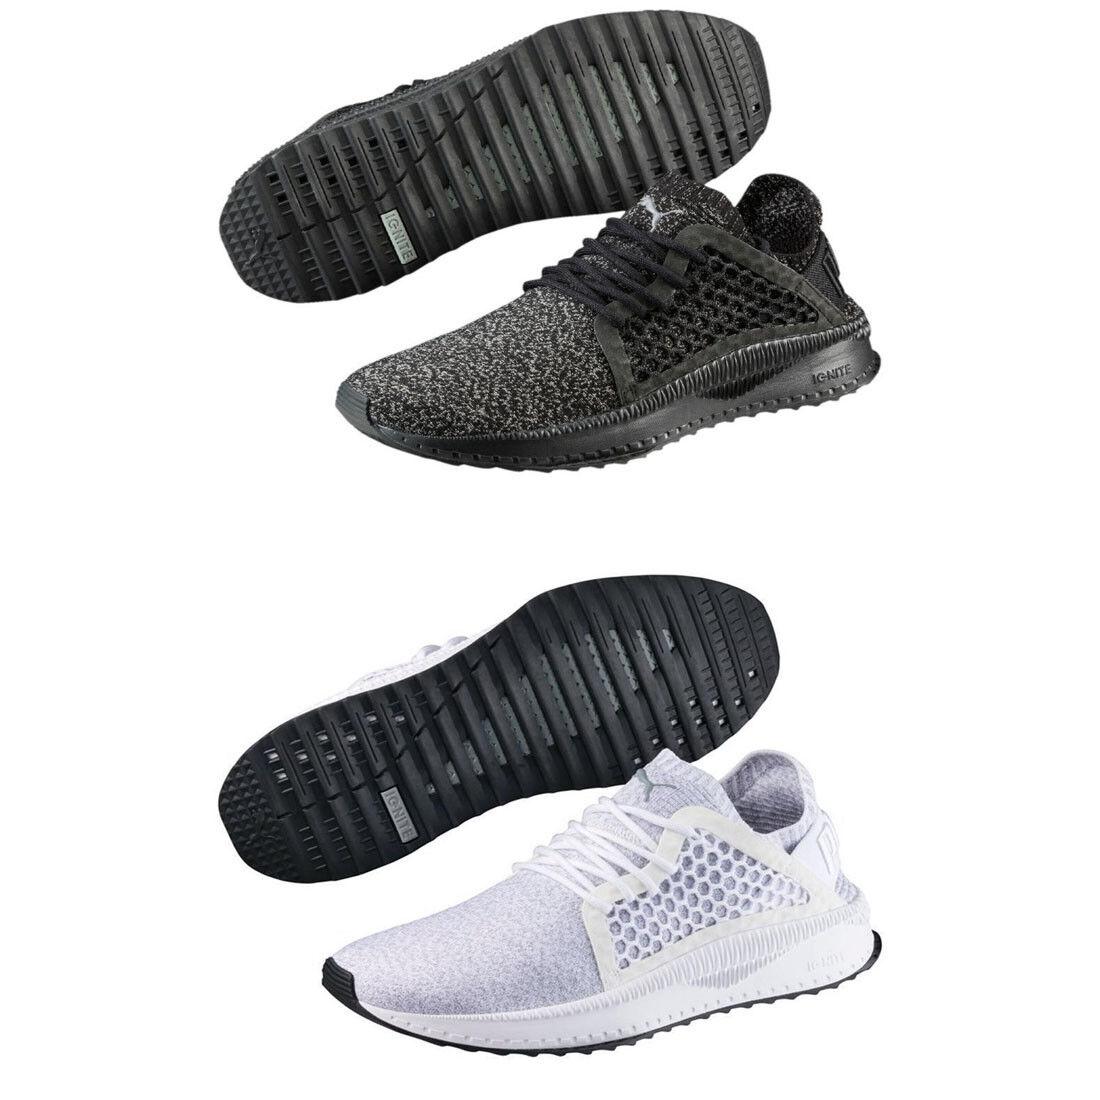 Puma TSUGI Netfit Evoknit Mens Trainers Shinshei Cage Black Olive White shoes